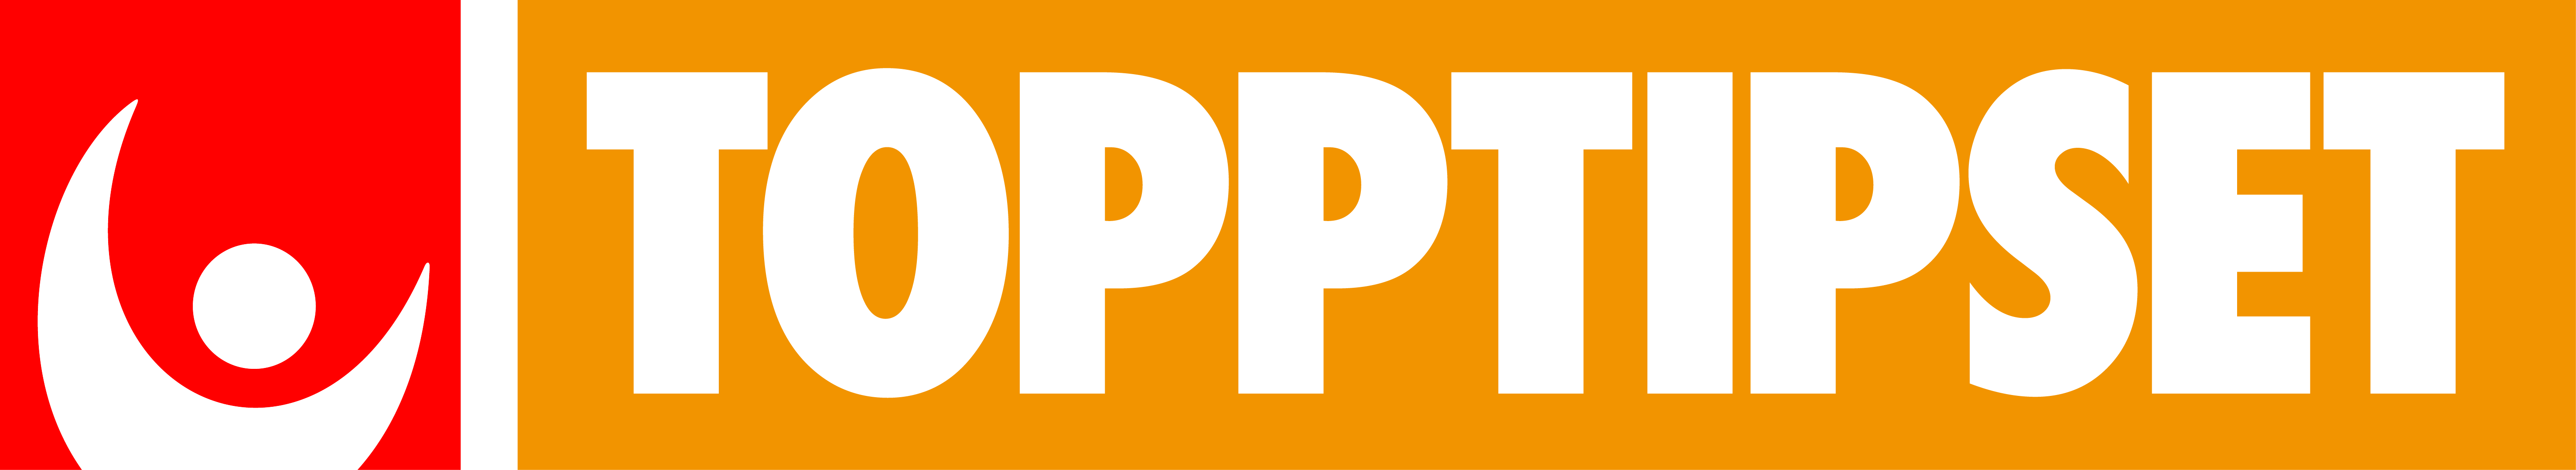 Topptipset_RGB